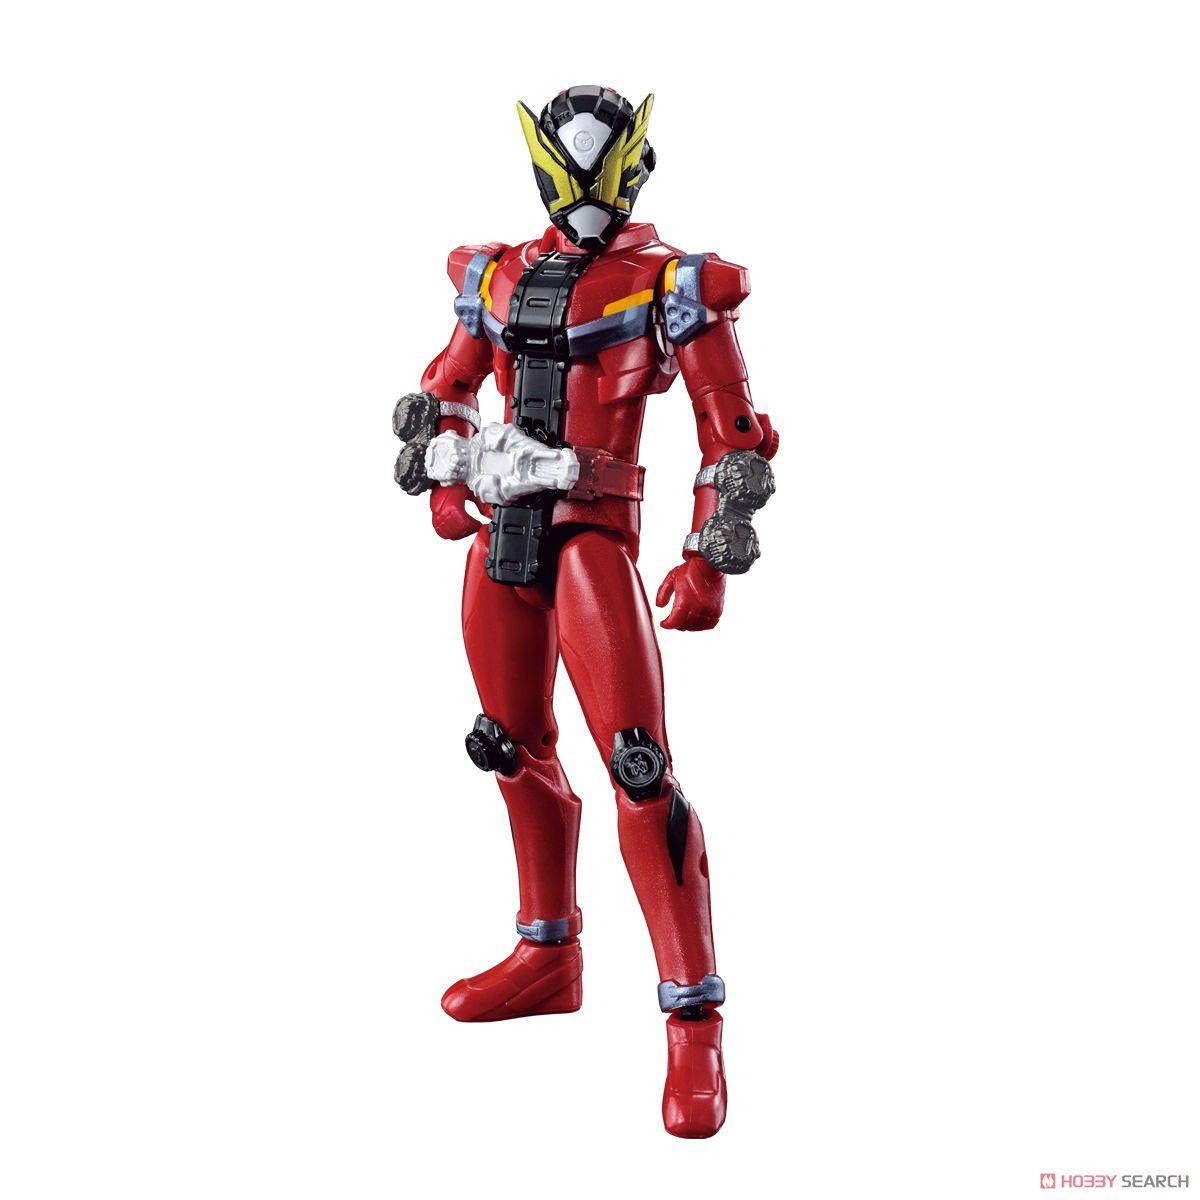 Kamen Rider Kicks Figure - Kamen Rider Geiz - Bandai Original